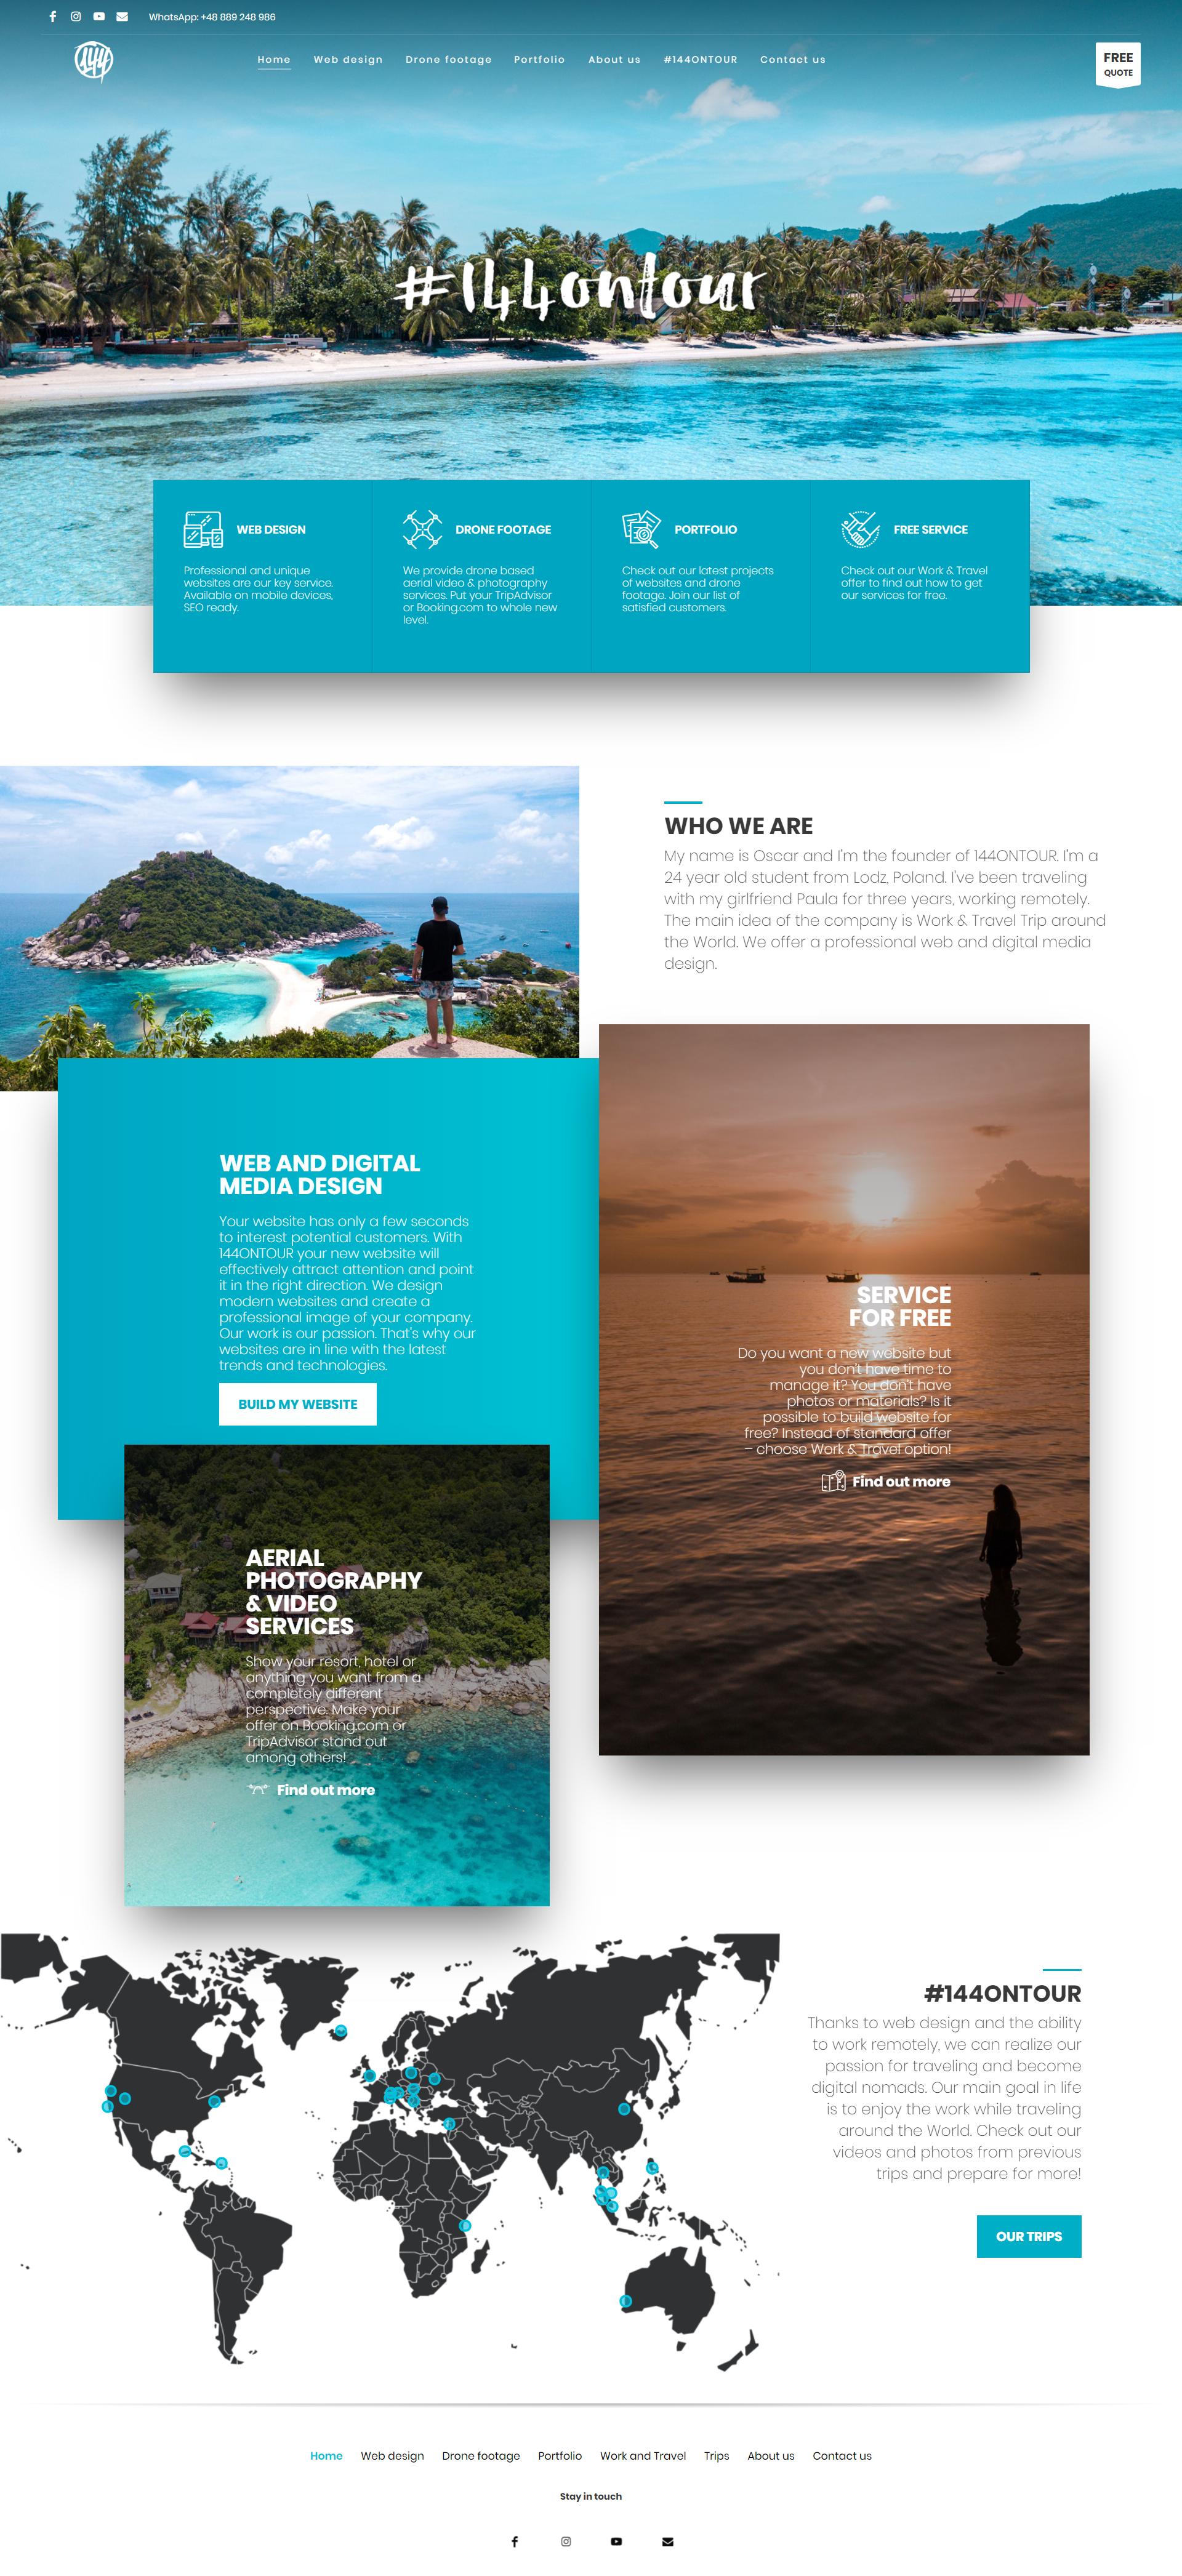 144ontour Travel Web Design Drone Footage On Behance Dizajn Interfejsa Dizajn Sajta Maket Sajta